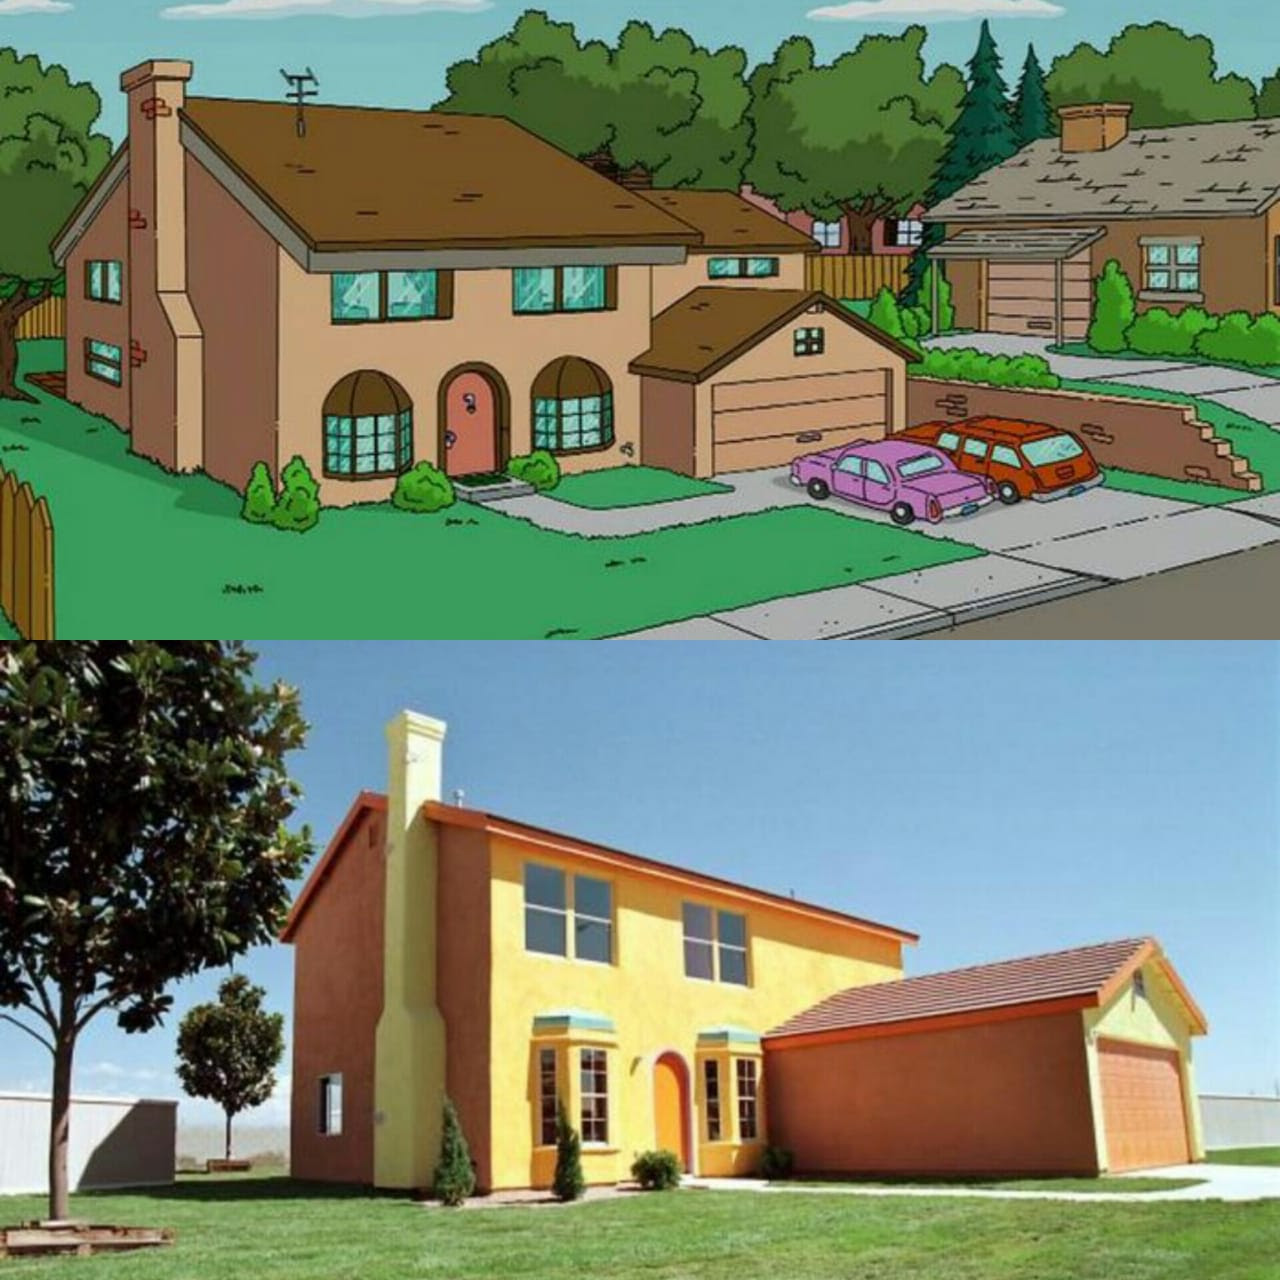 5700 Gambar Rumah Animasi Lucu Terbaik